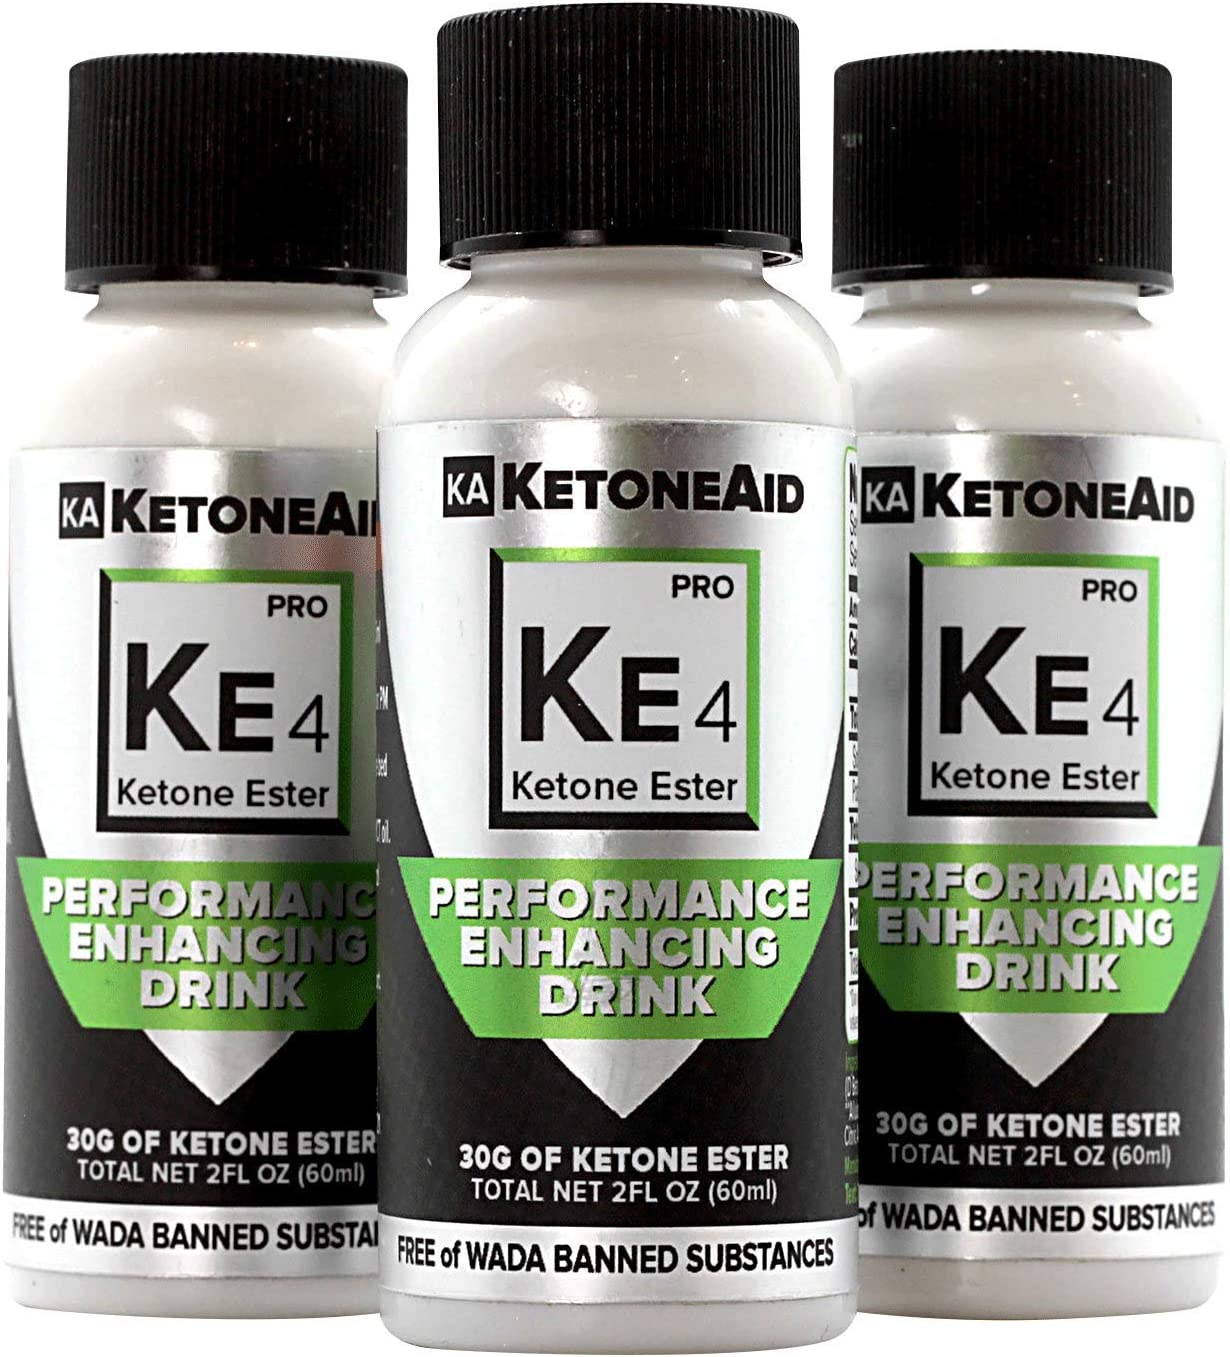 KetoneAid KE4 World's Strongest Courier shipping free Ketone 30g Drink Ester 2021 new Exogenou